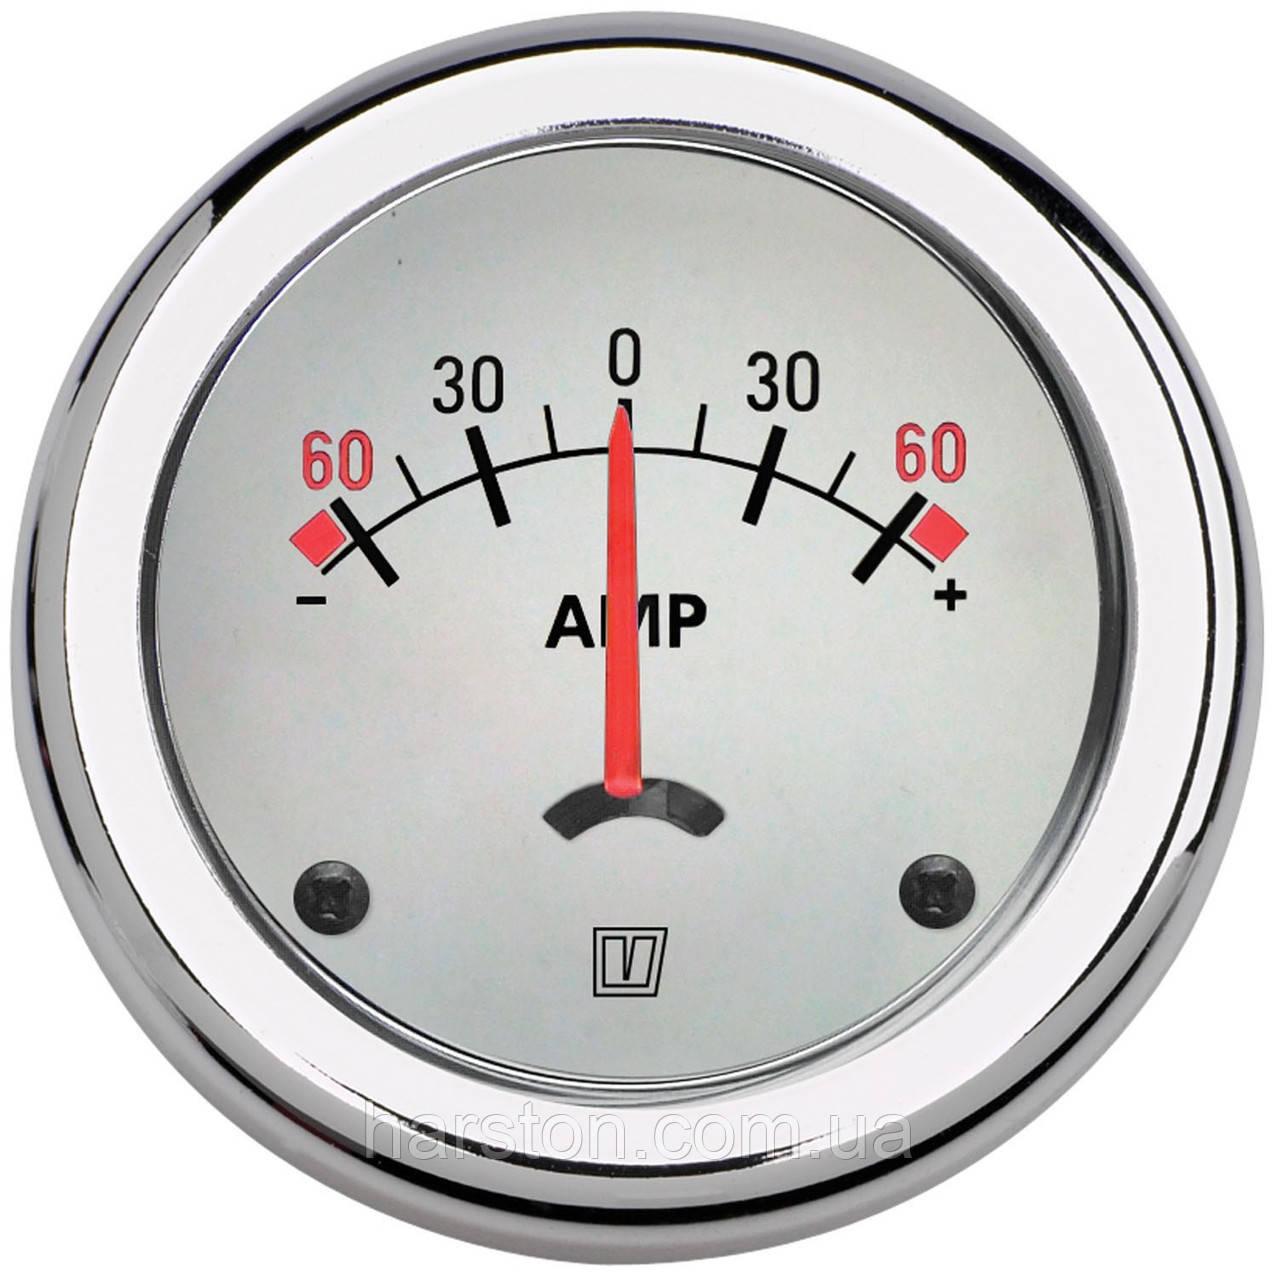 Амперметр VETUS AMPWL c шунтом